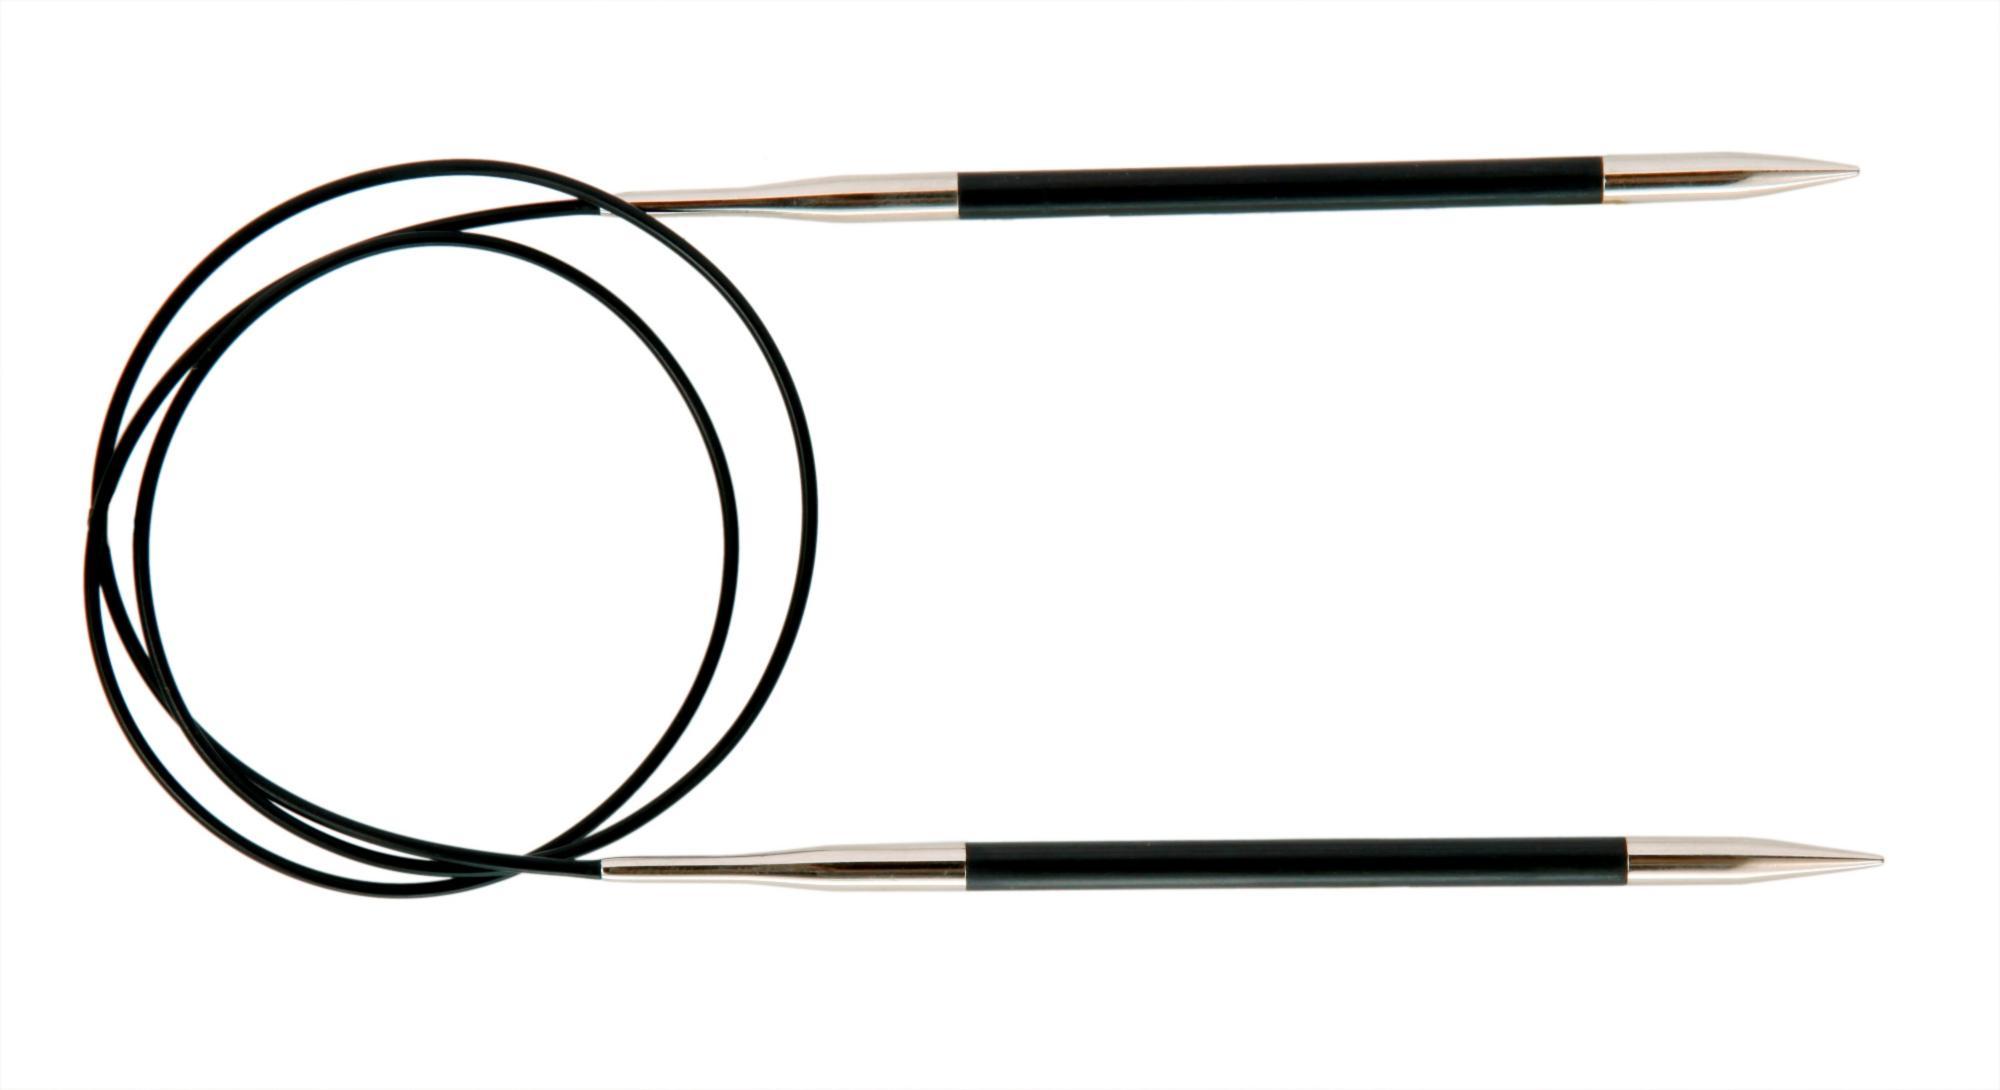 Спицы круговые 60 см Karbonz KnitPro, 41174, 7.00 мм